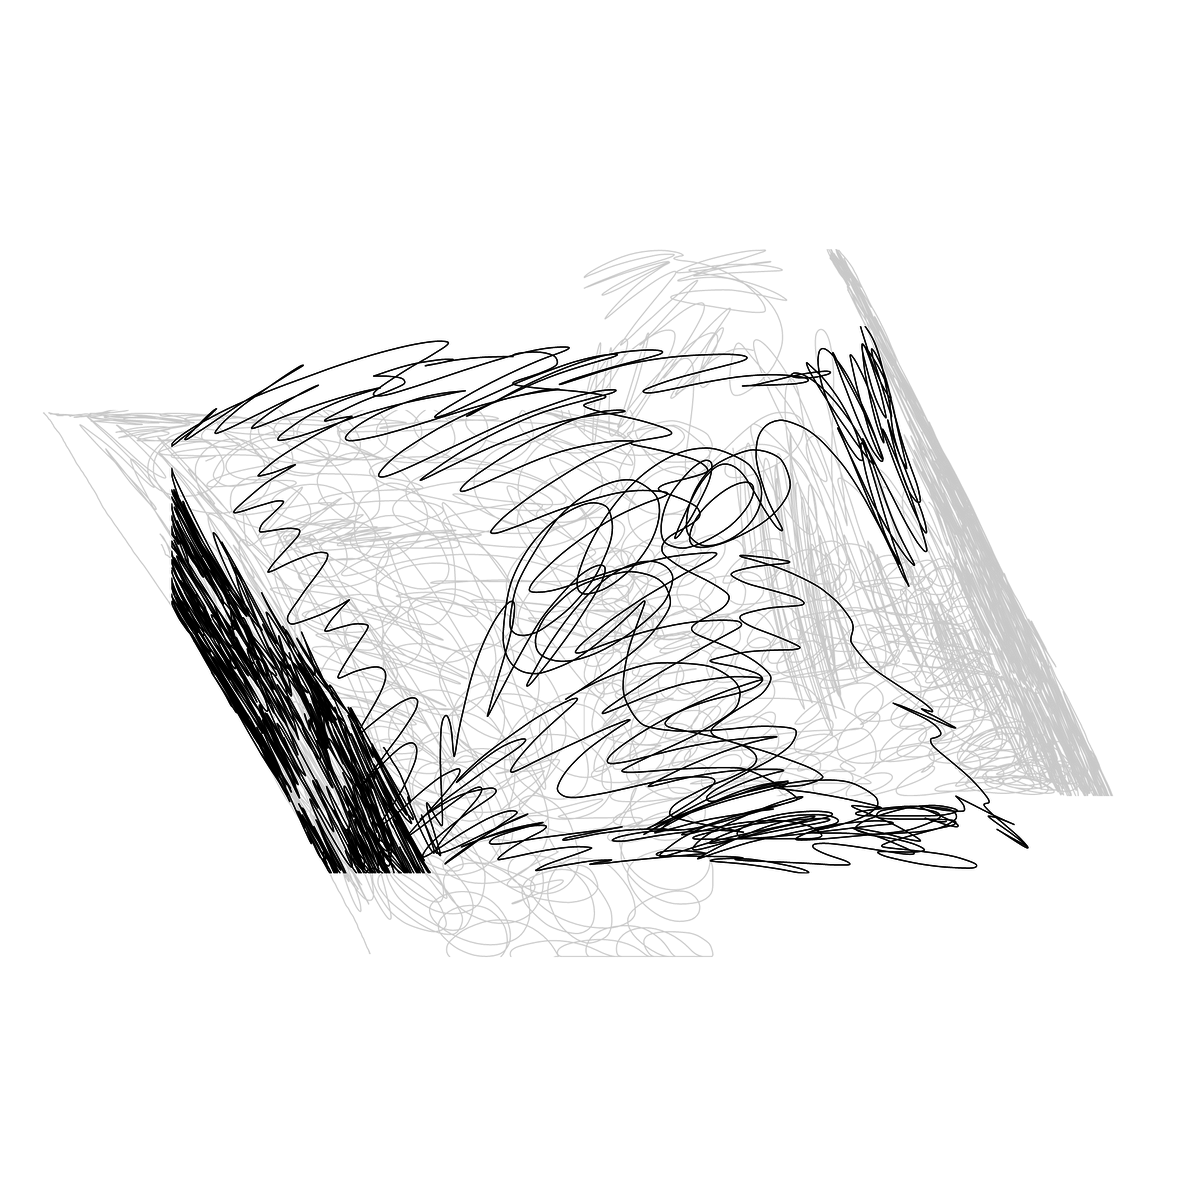 BAAAM drawing#6164 lat:52.4879684448242200lng: 13.4253425598144530